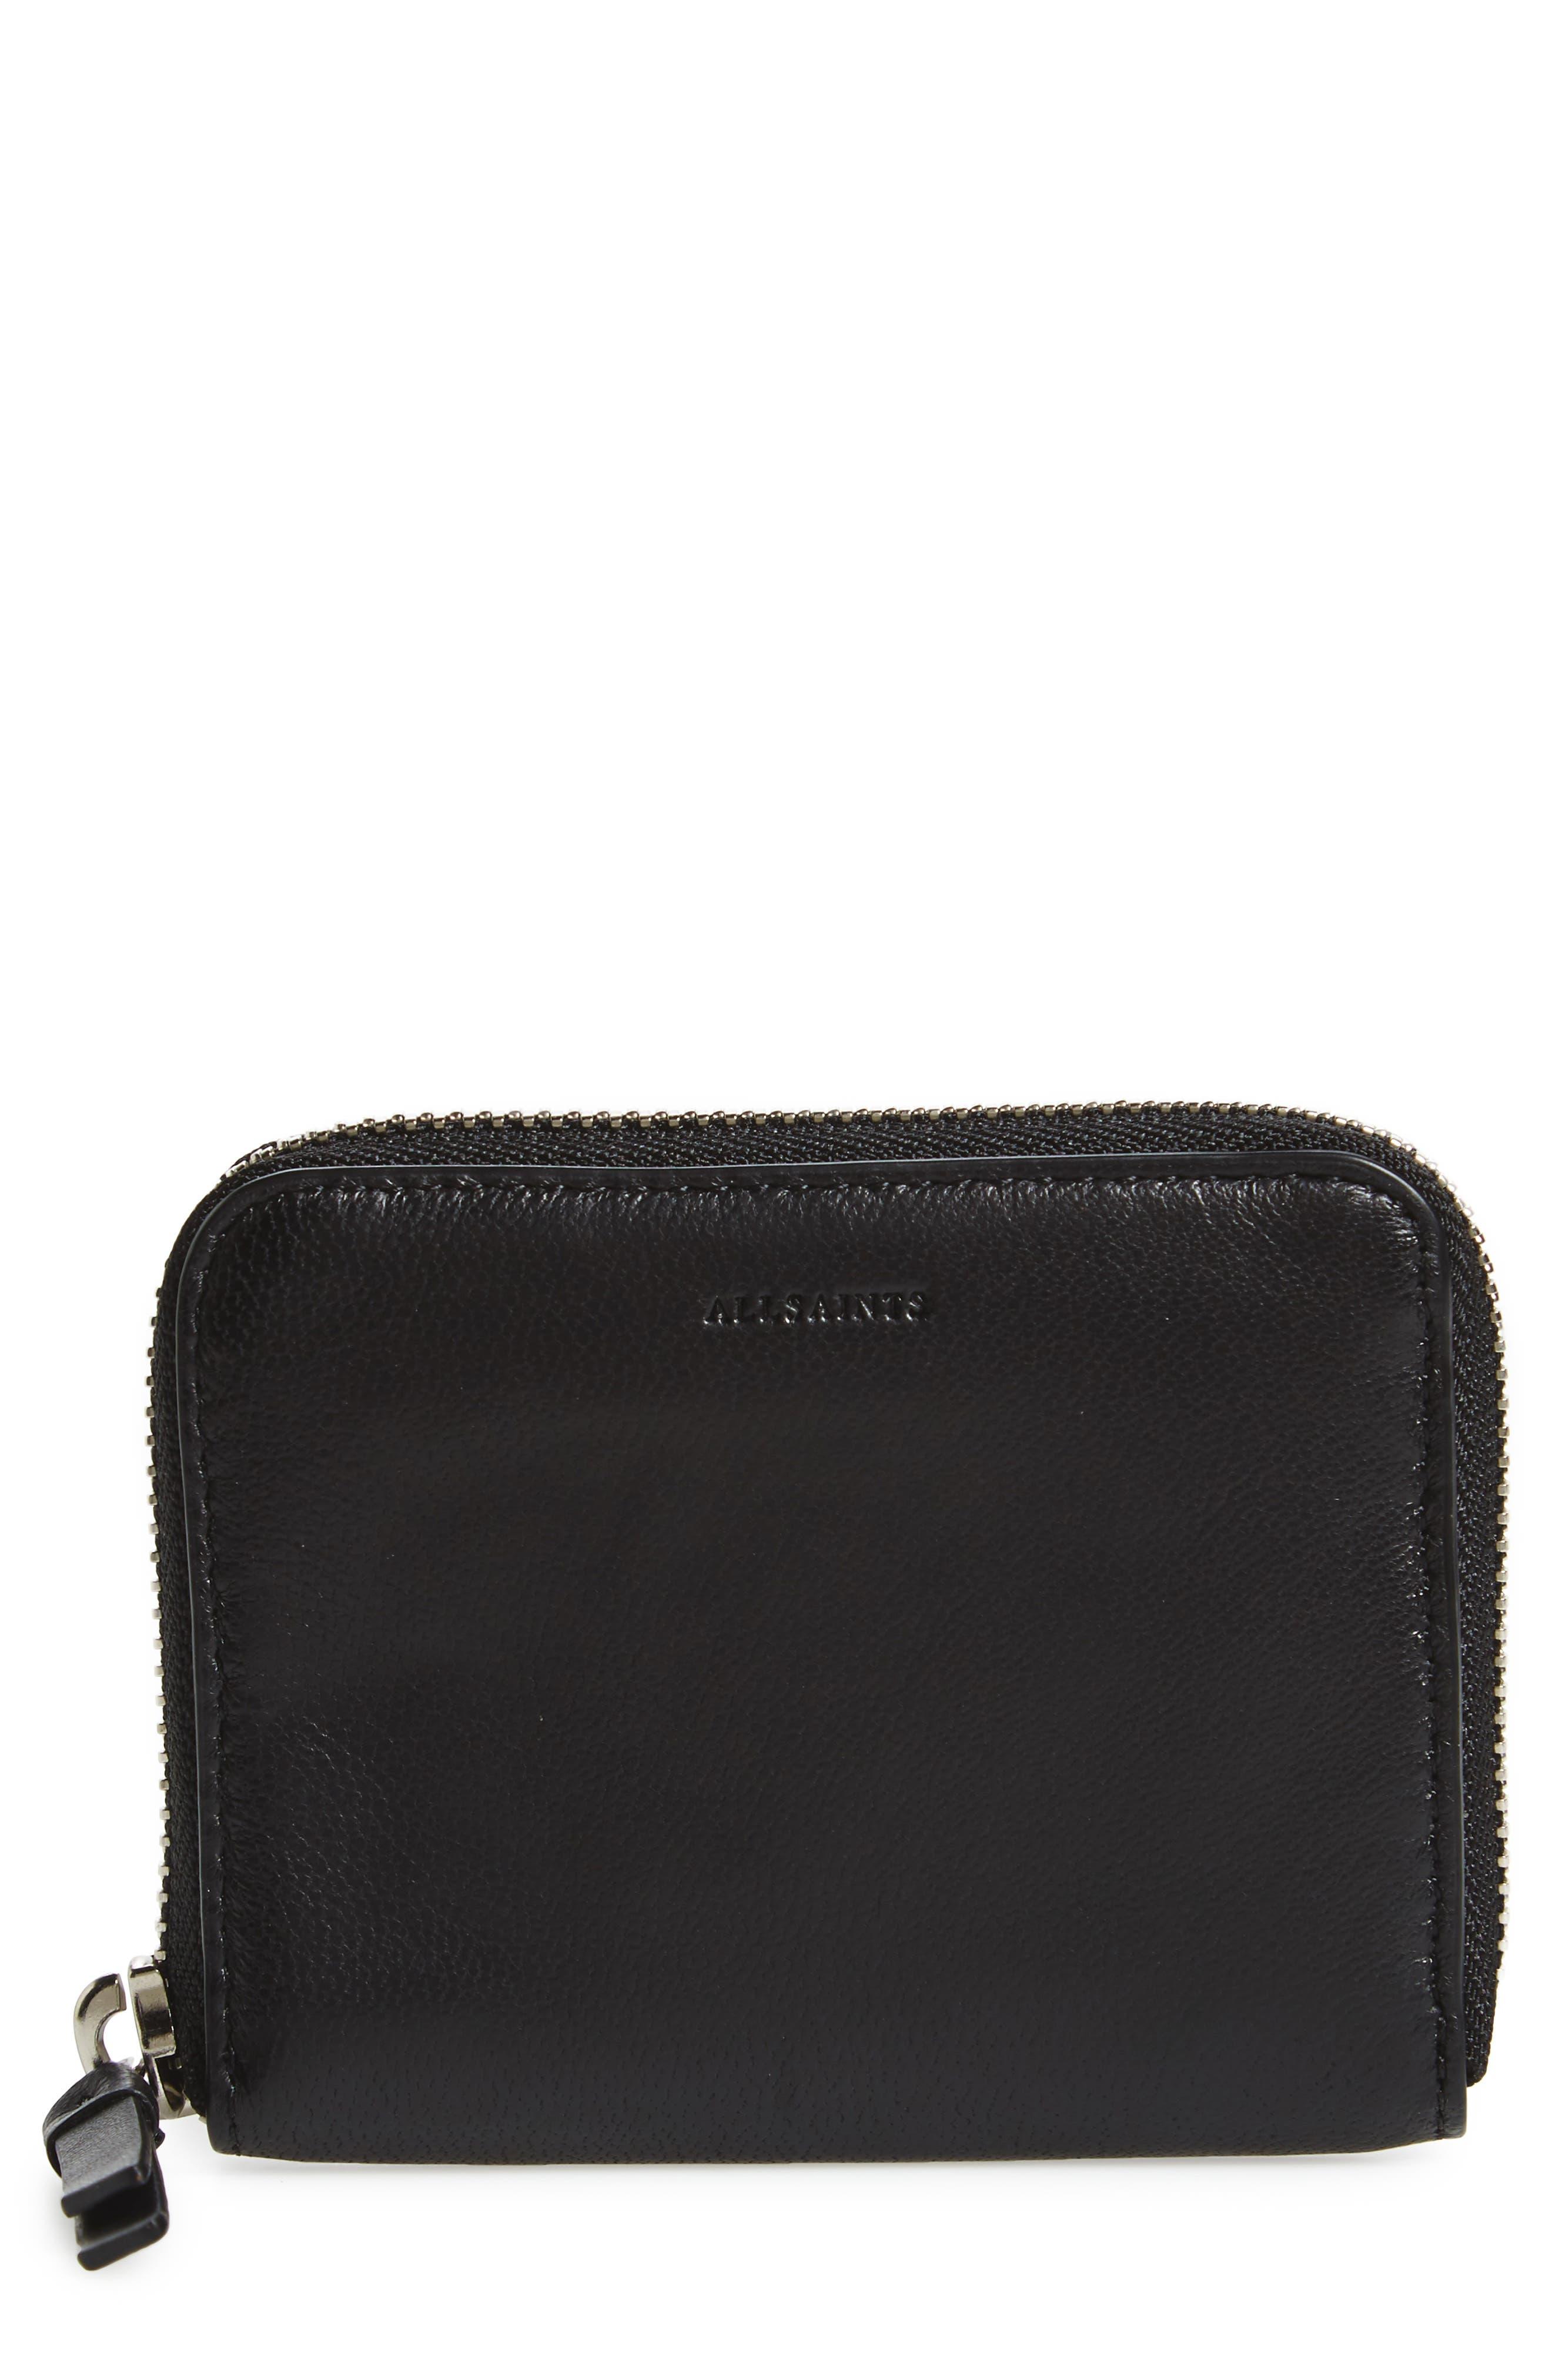 Kanda Mini Zip Wallet,                             Main thumbnail 1, color,                             001